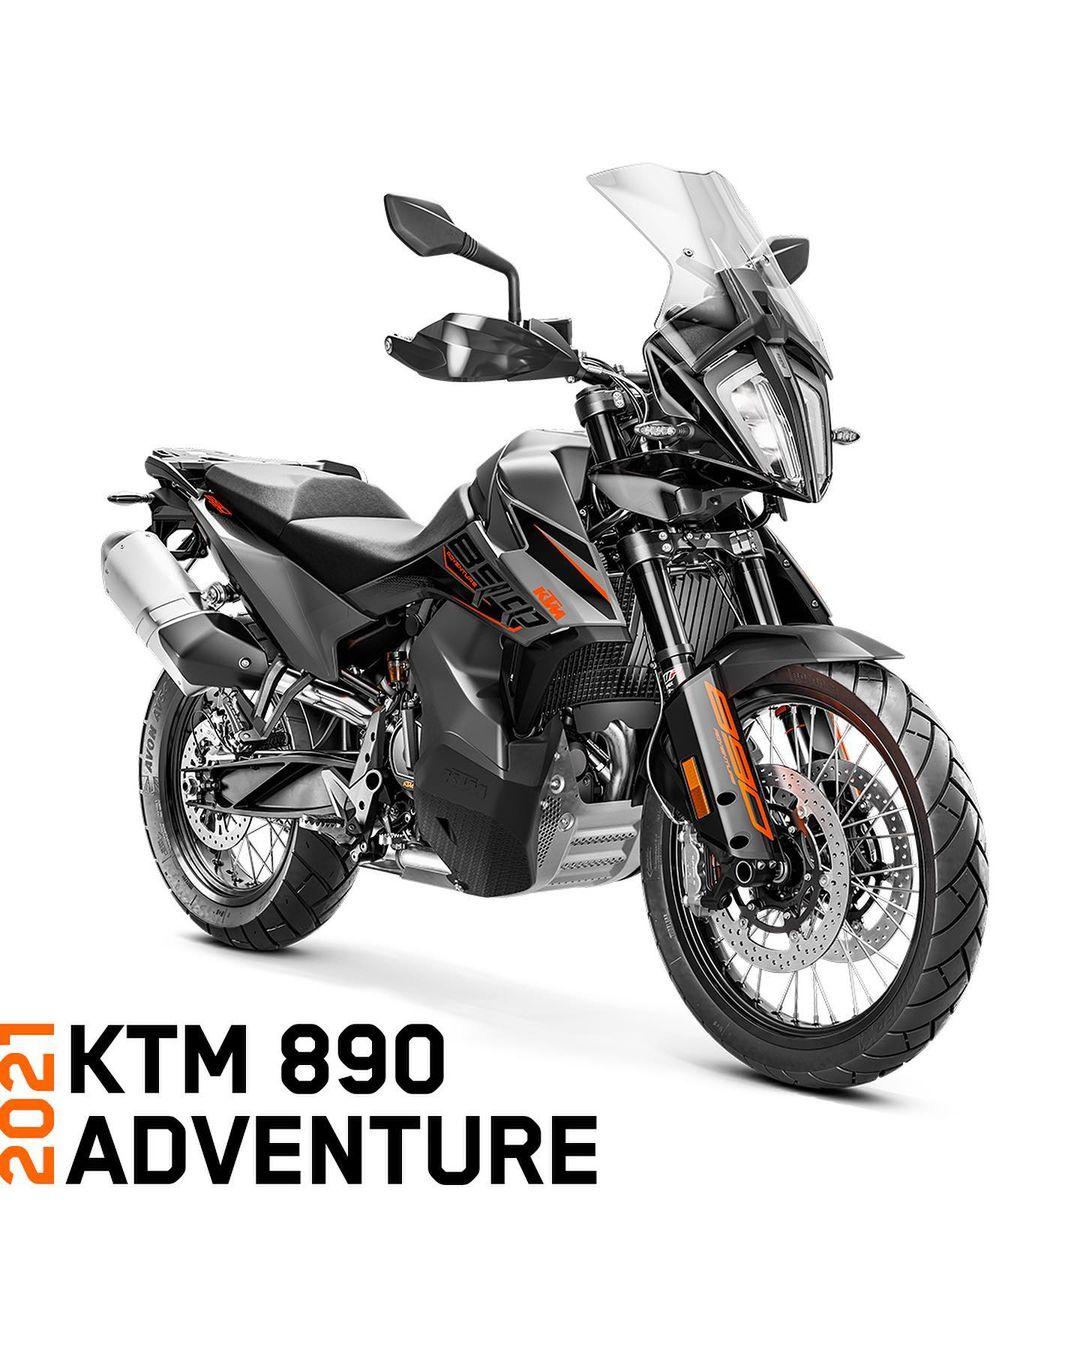 Ktm890adventure2020.jpg